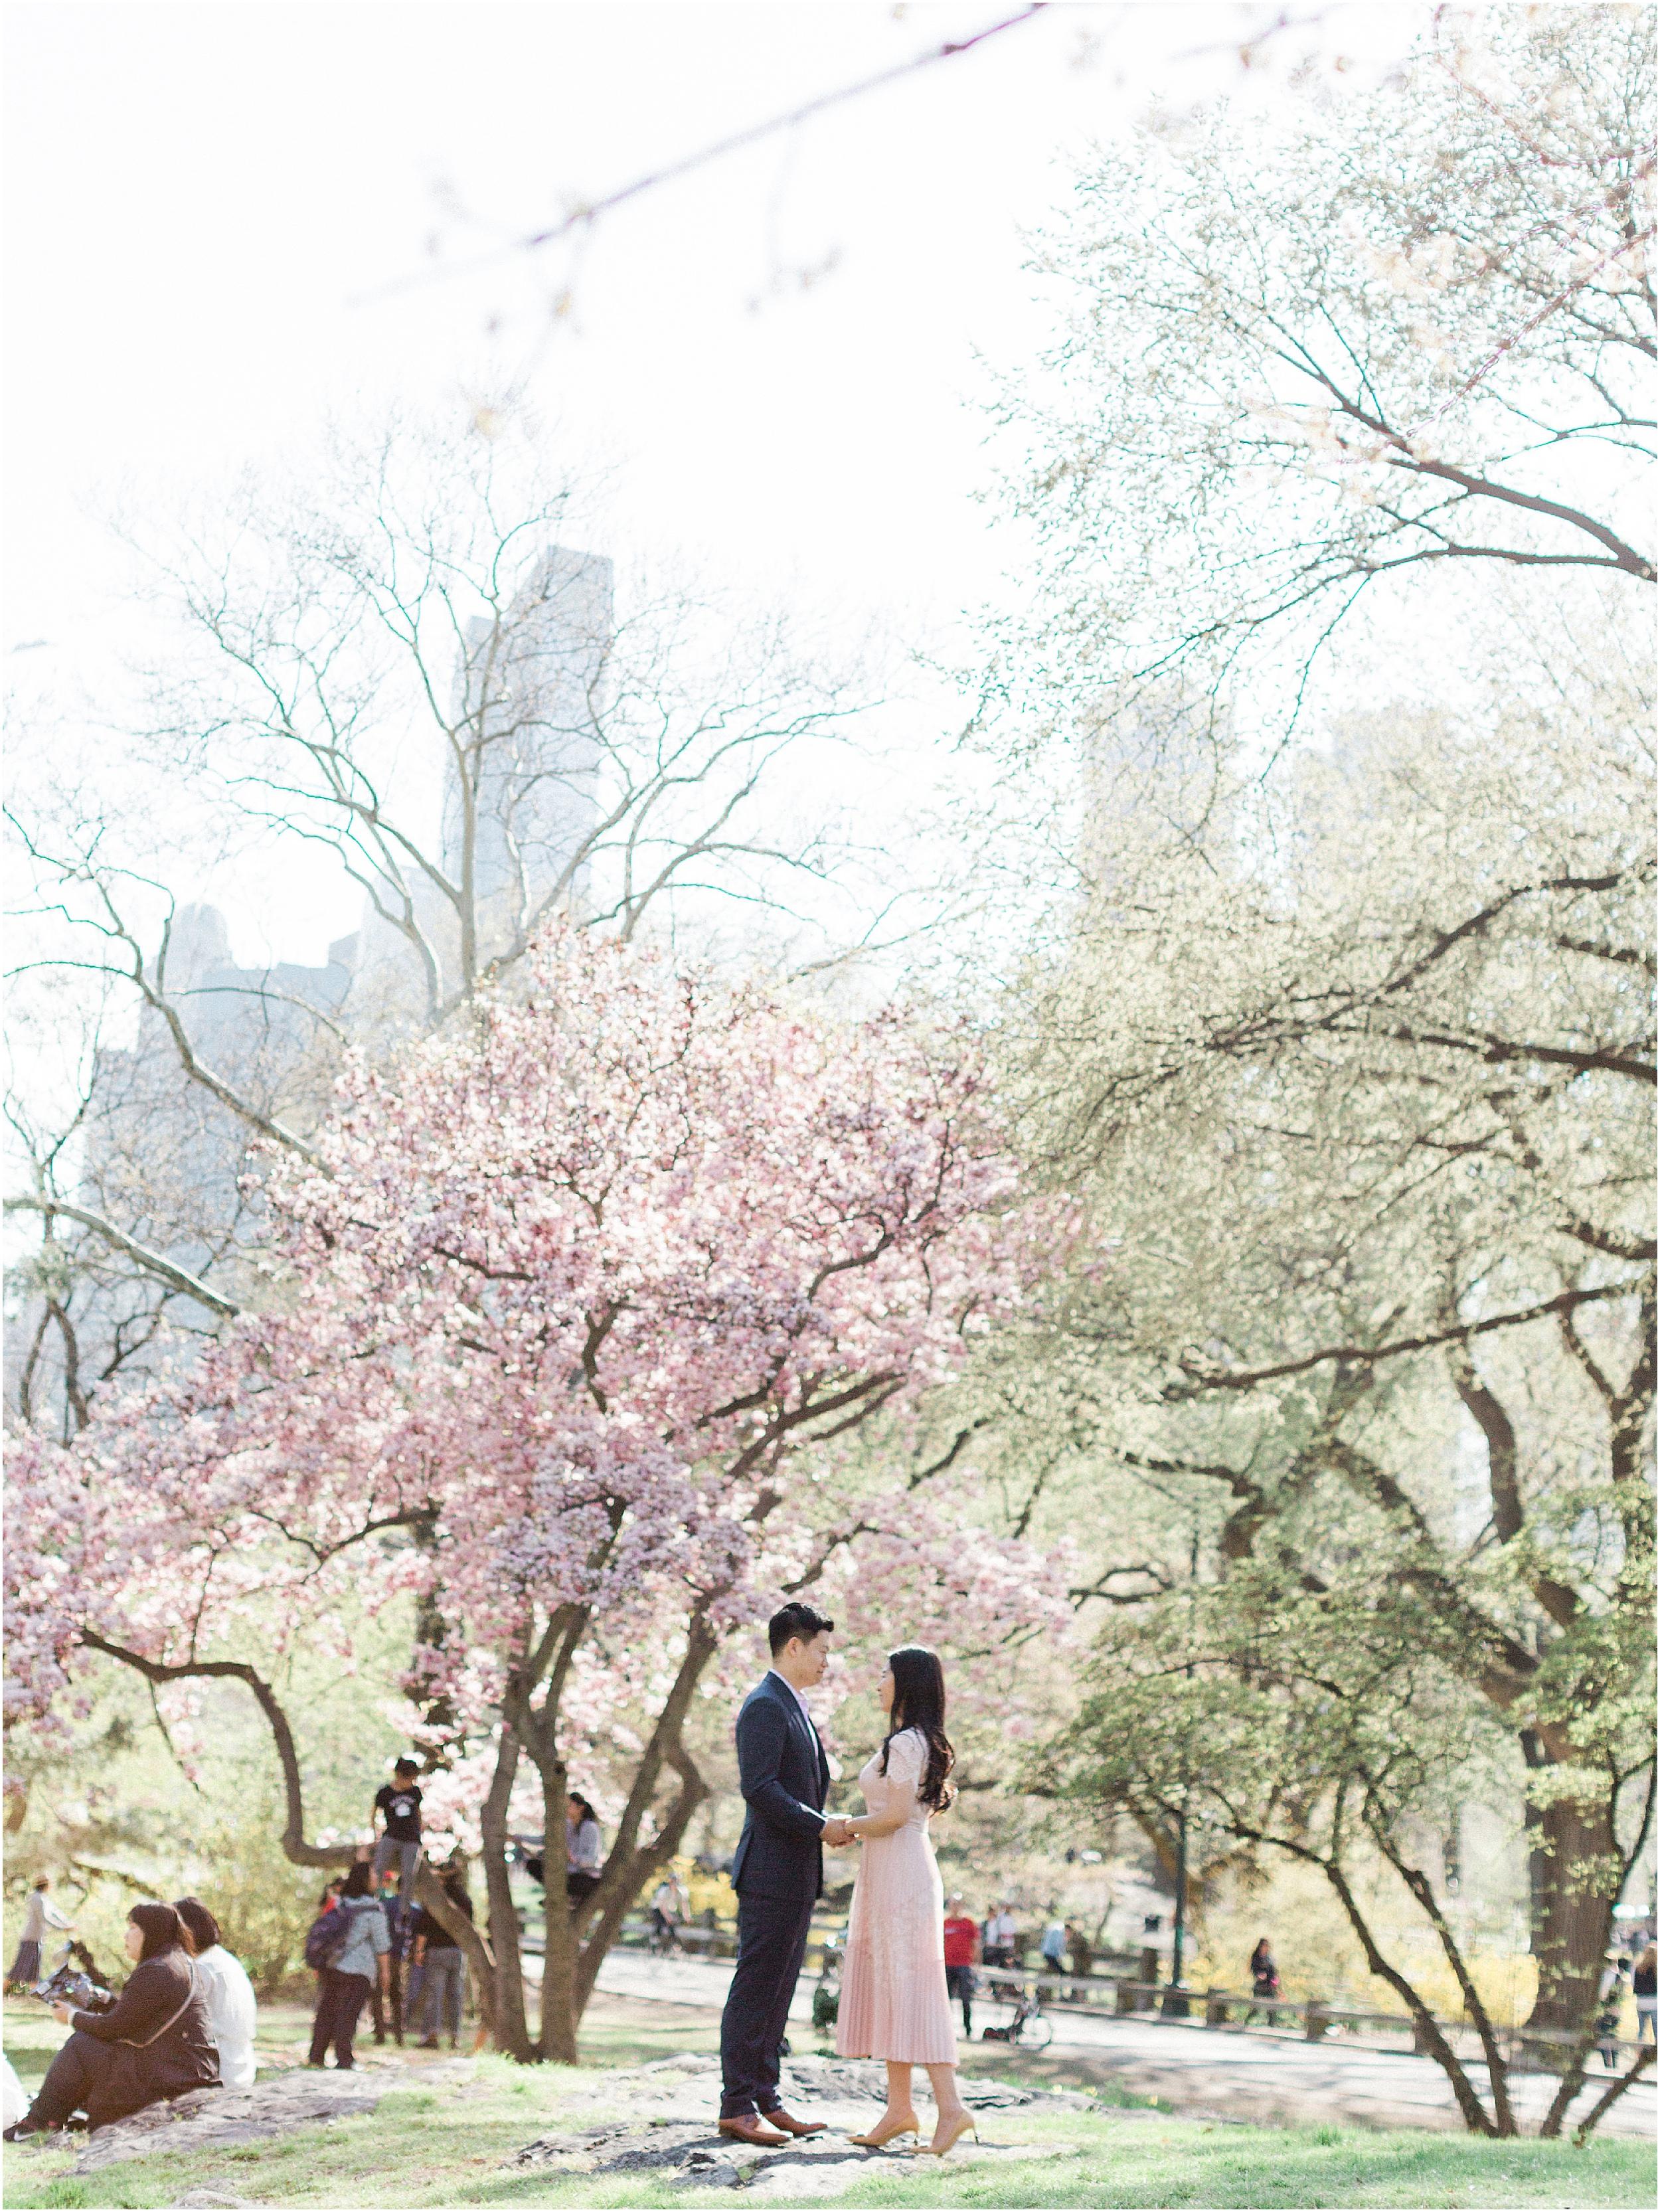 JeremiahRachelPhotography_CentralPark_NYC_SpringtimeBloom_EngagementSession0014.JPG